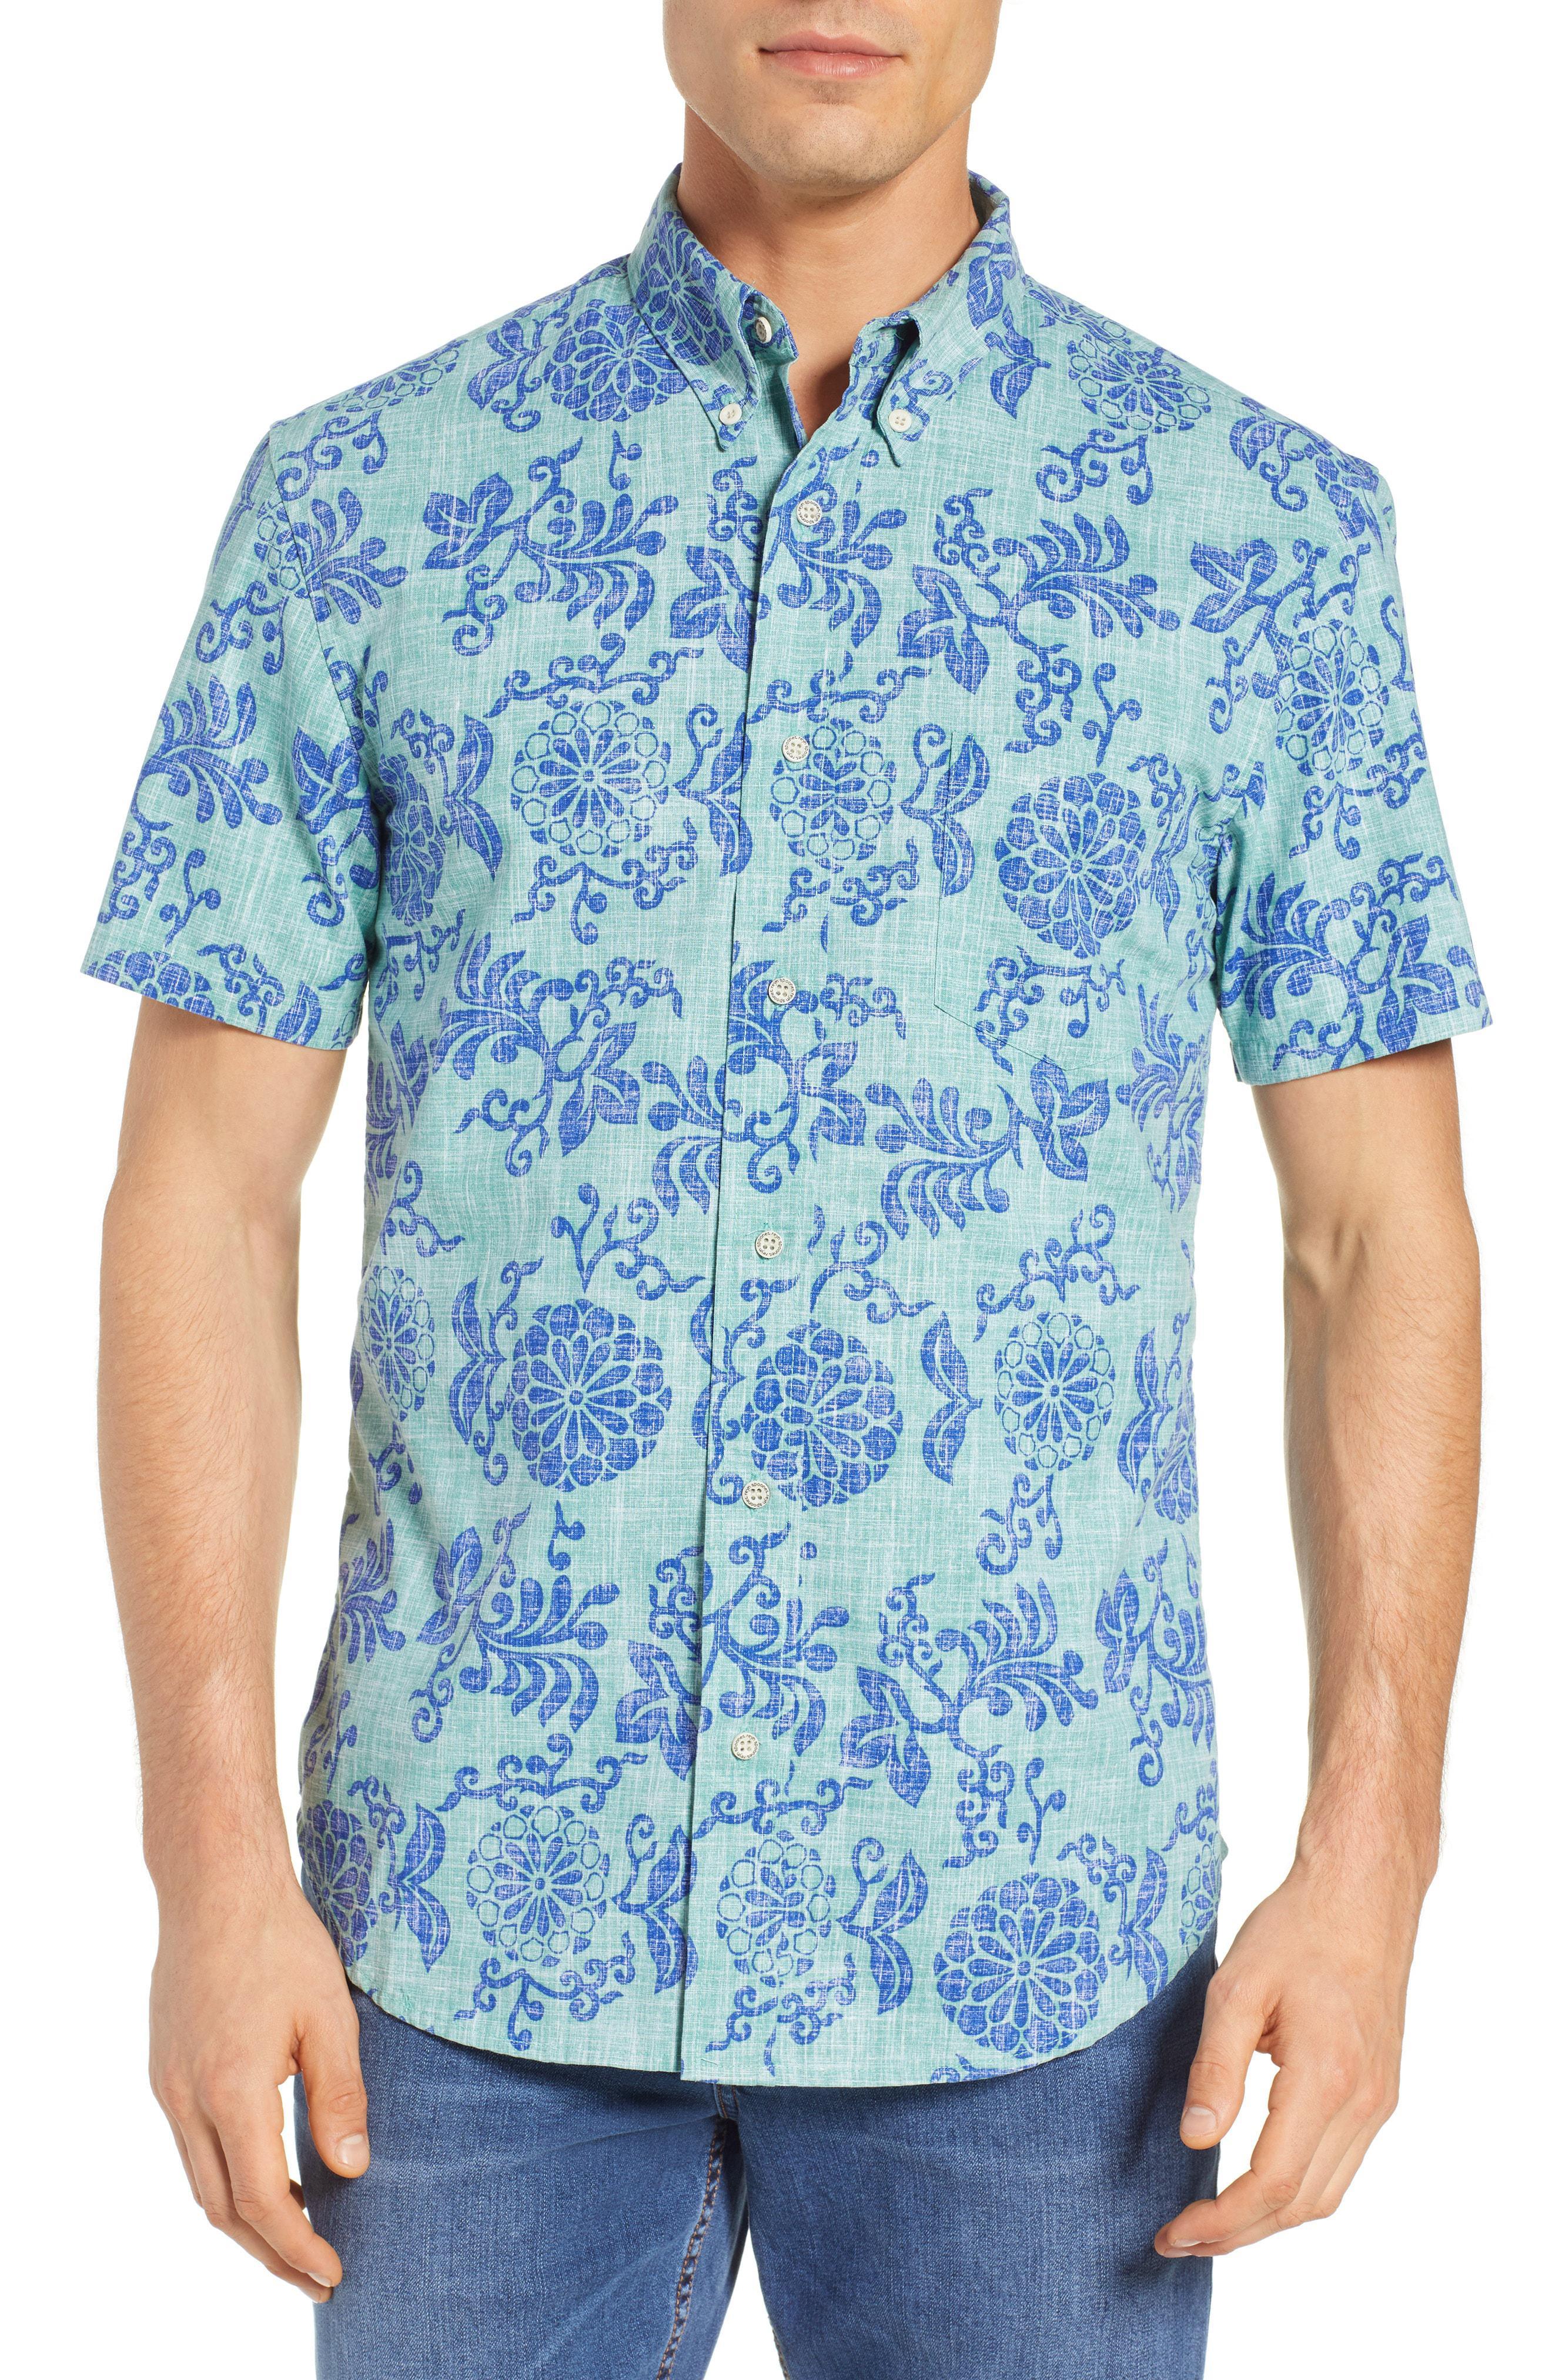 22d57a0e Lyst - Reyn Spooner Royal Chrysanthemums Regular Fit Sport Shirt in ...